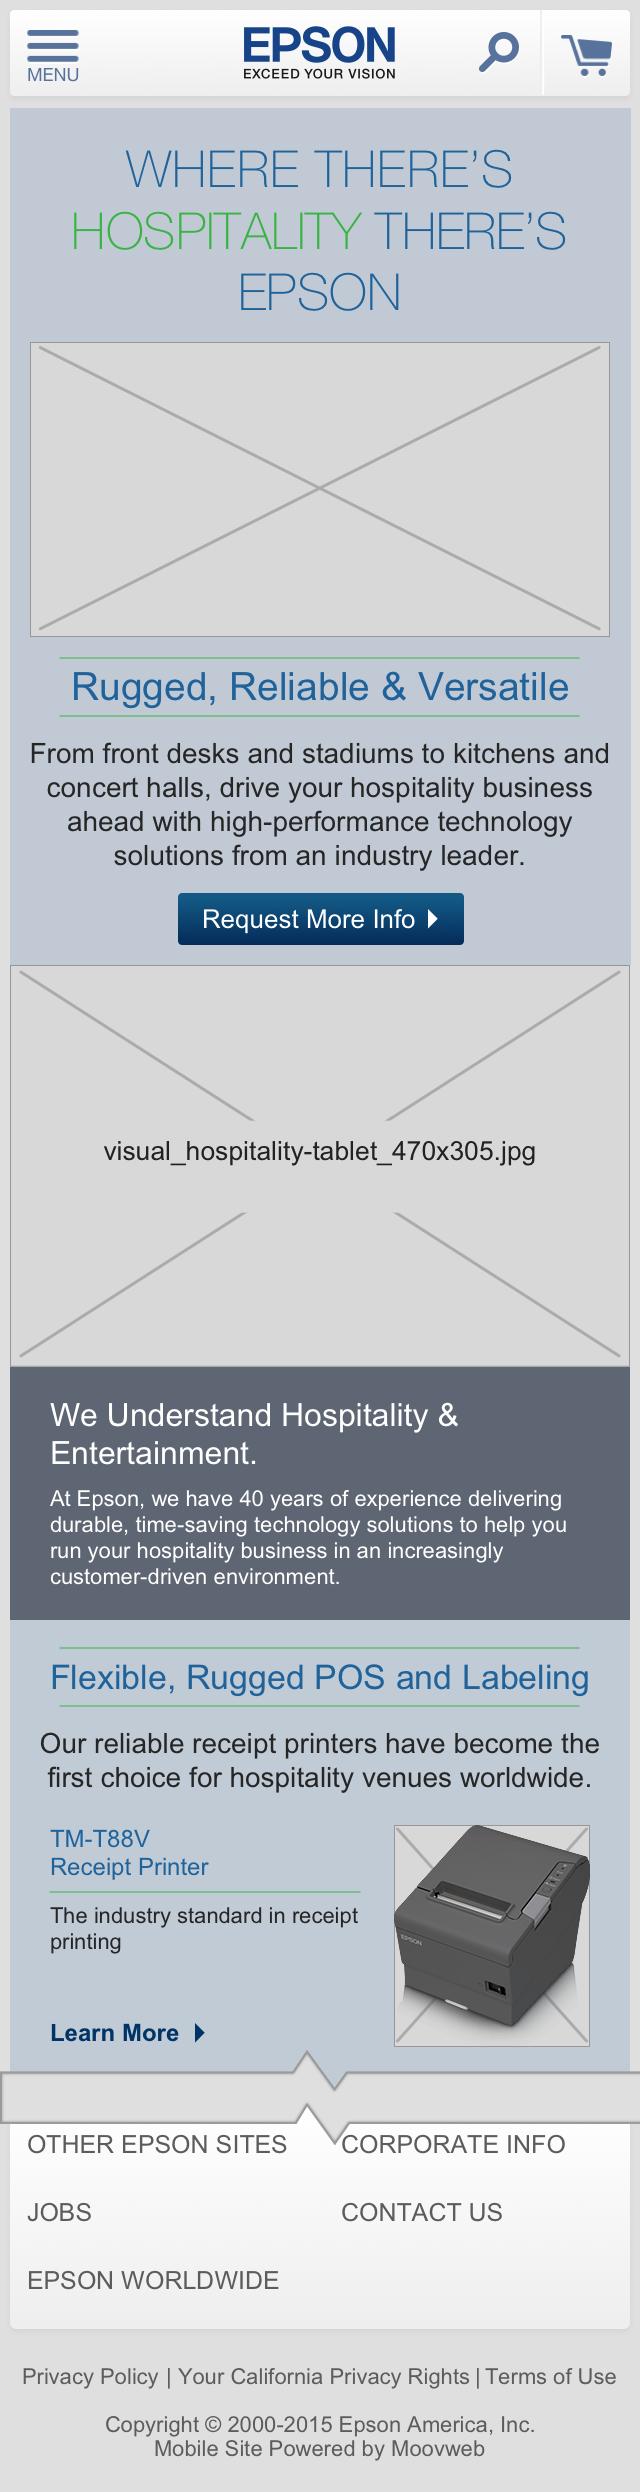 Hospitality Case Studies